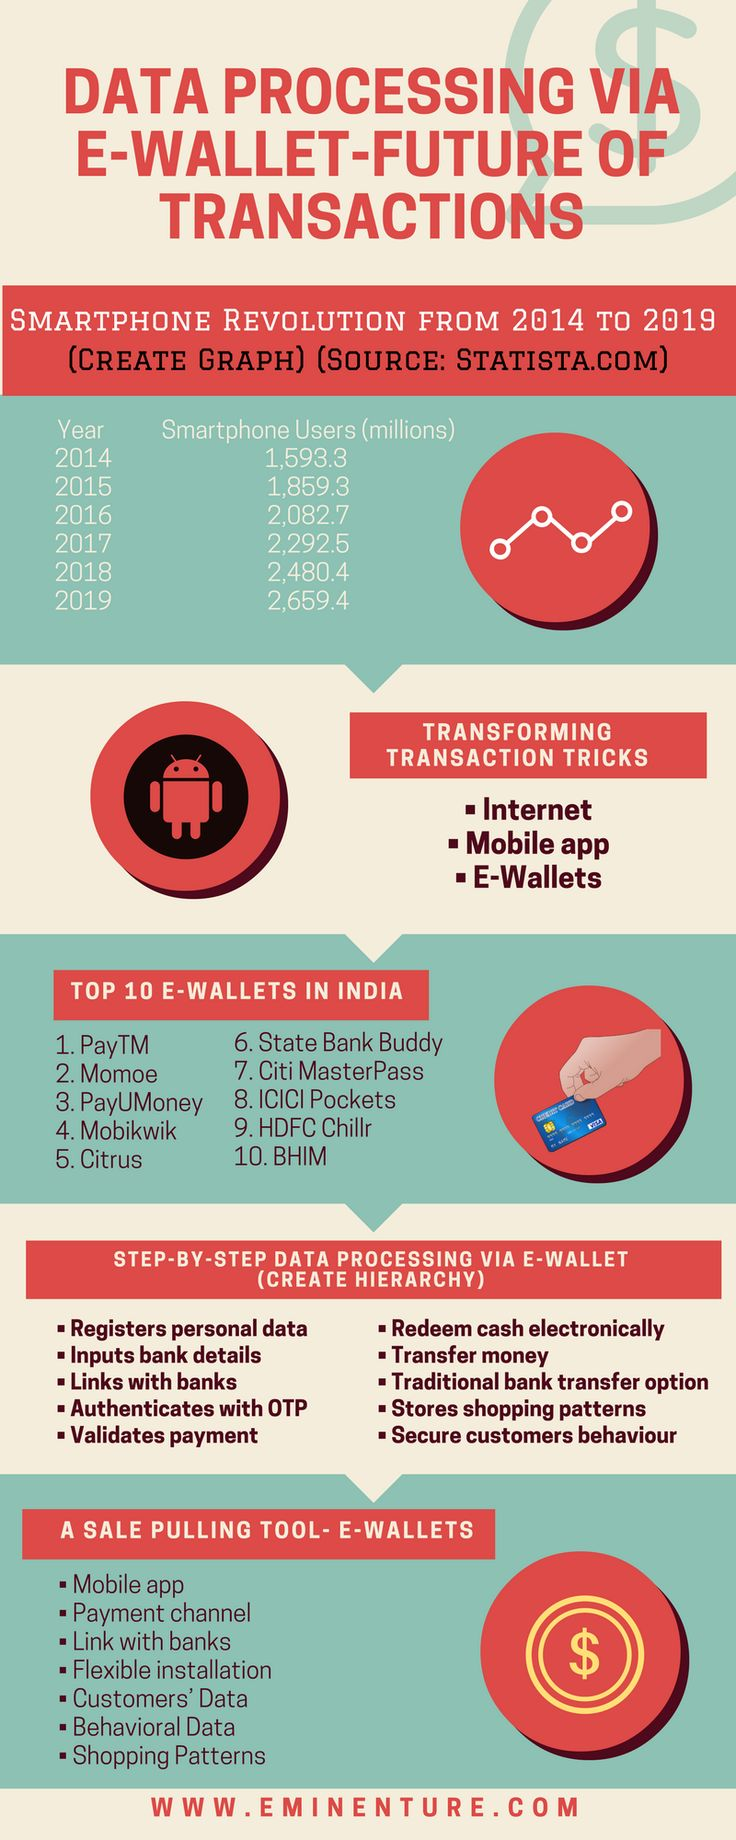 Data Processing via e-Wallet-Future of Transactions